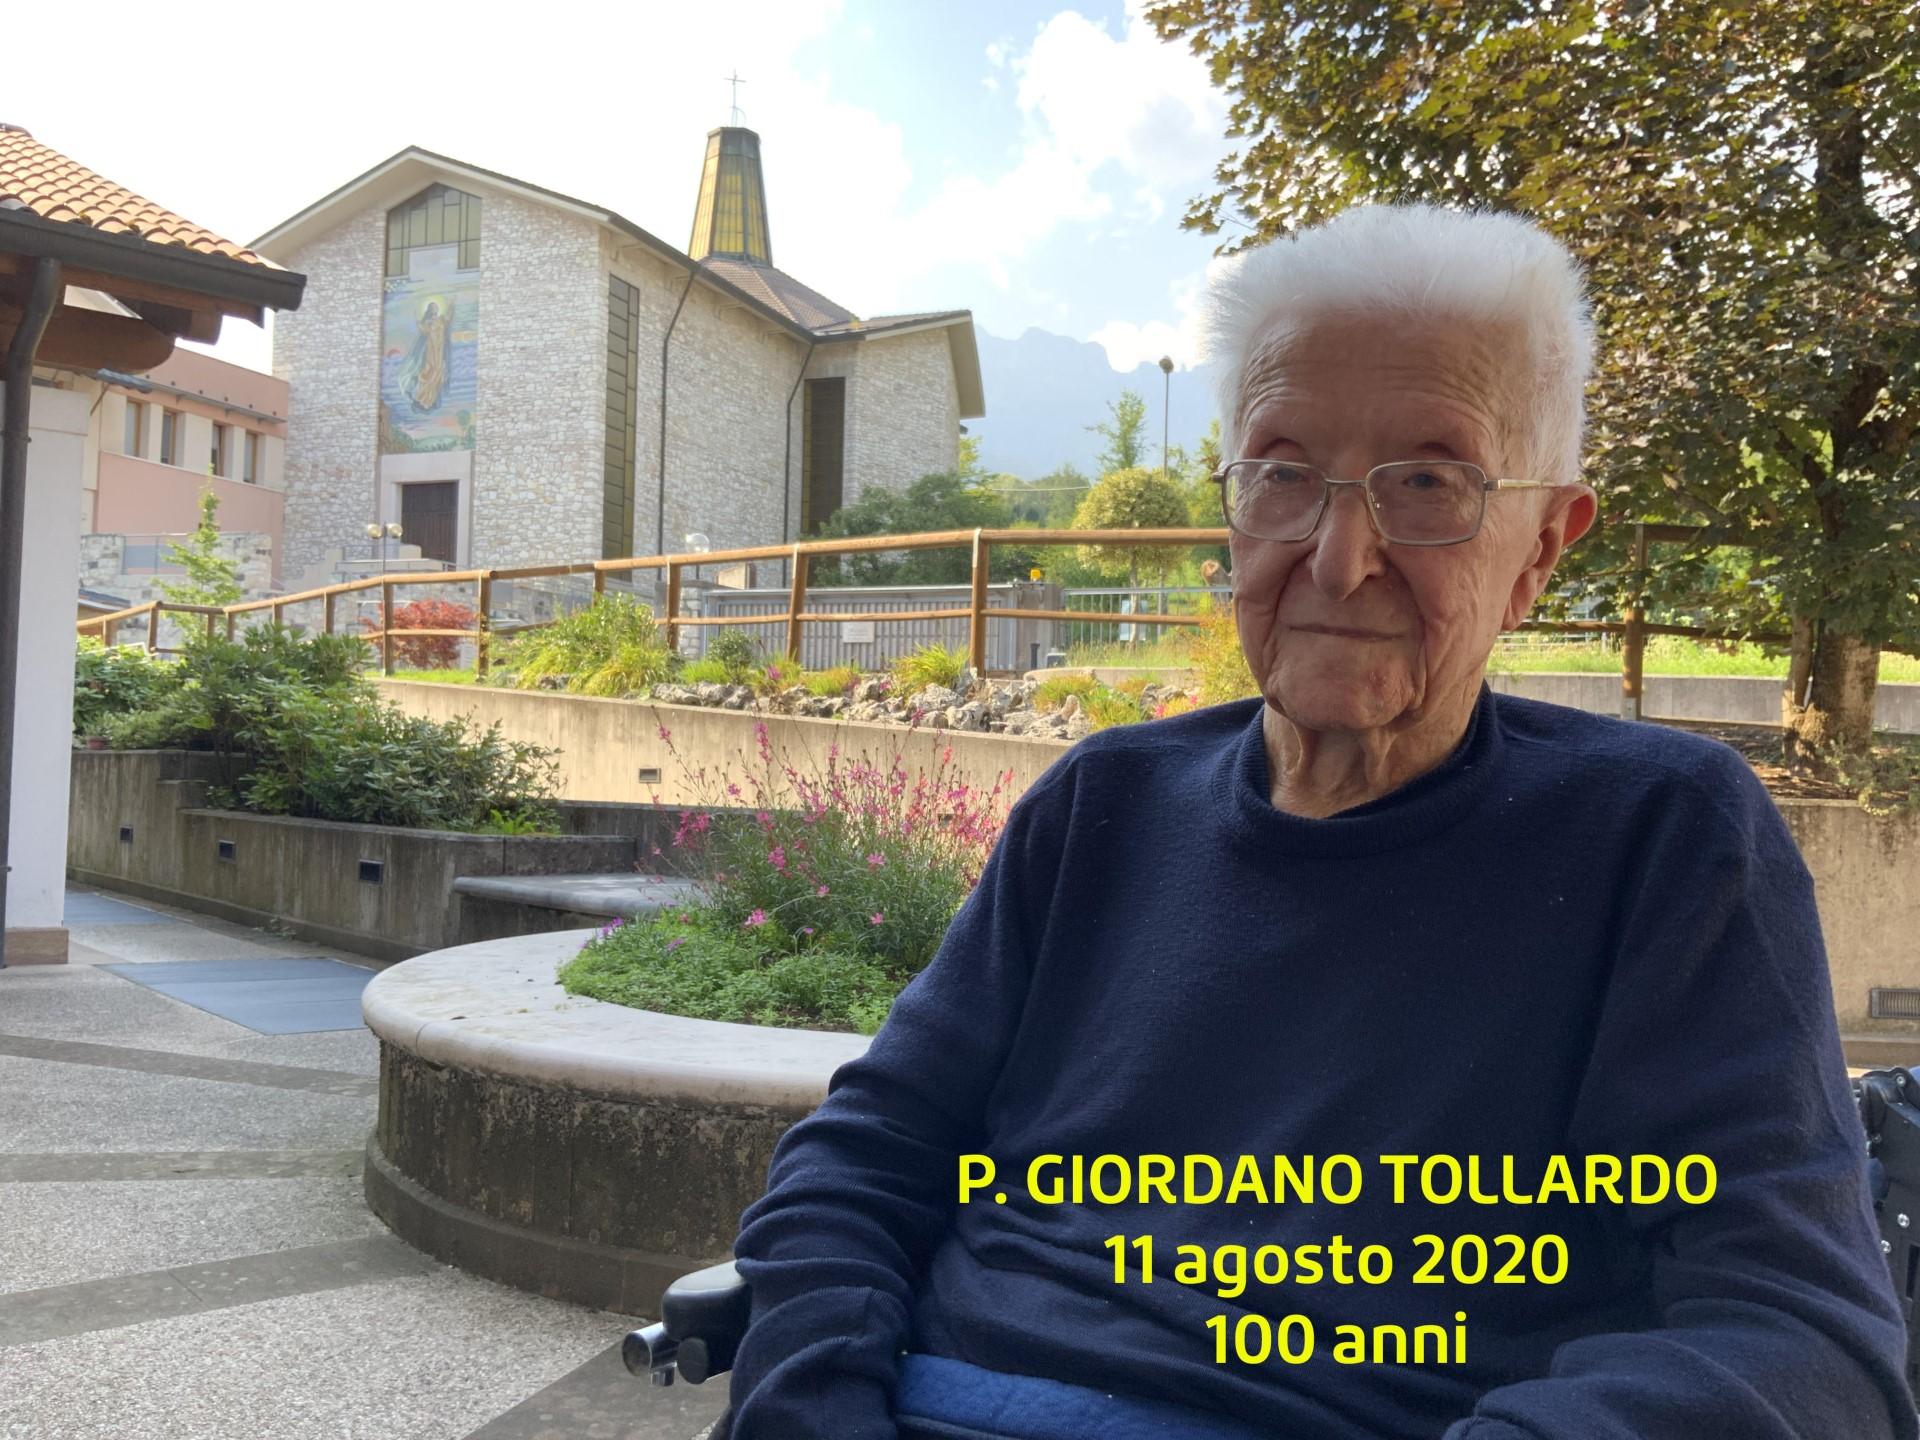 Padre Giordano Tollardo